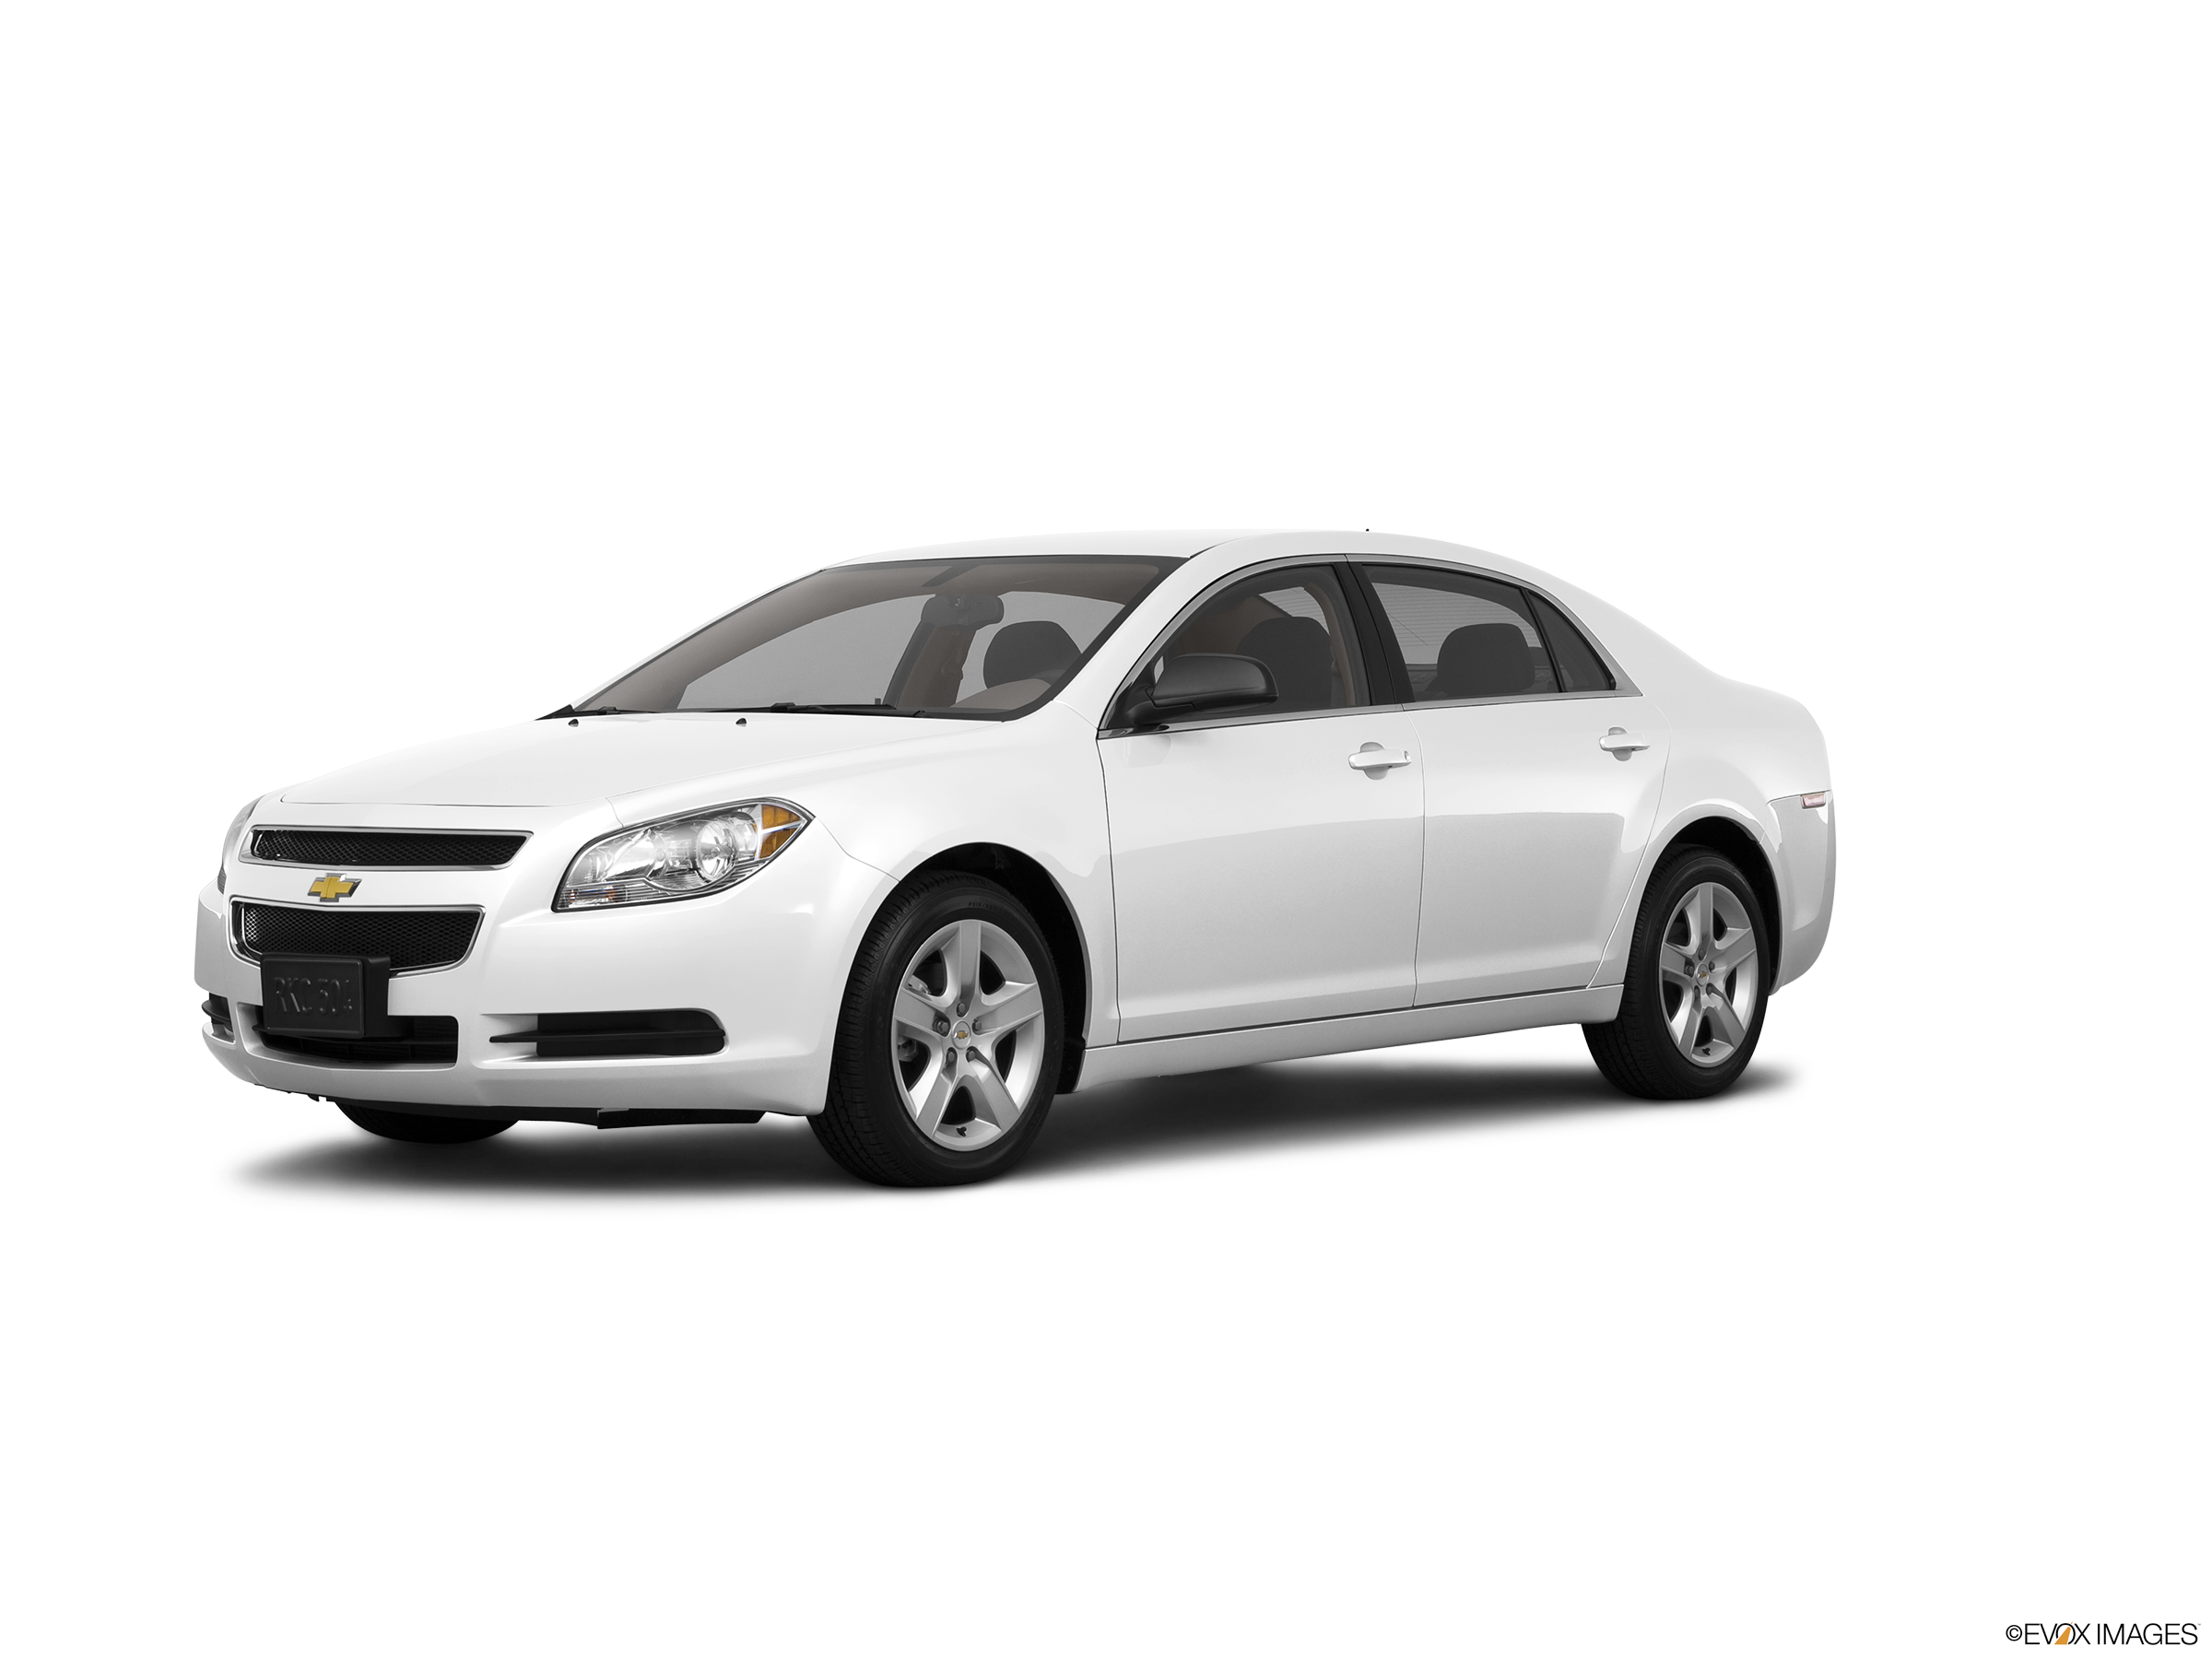 2011 Chevrolet Malibu Values Cars For Sale Kelley Blue Book